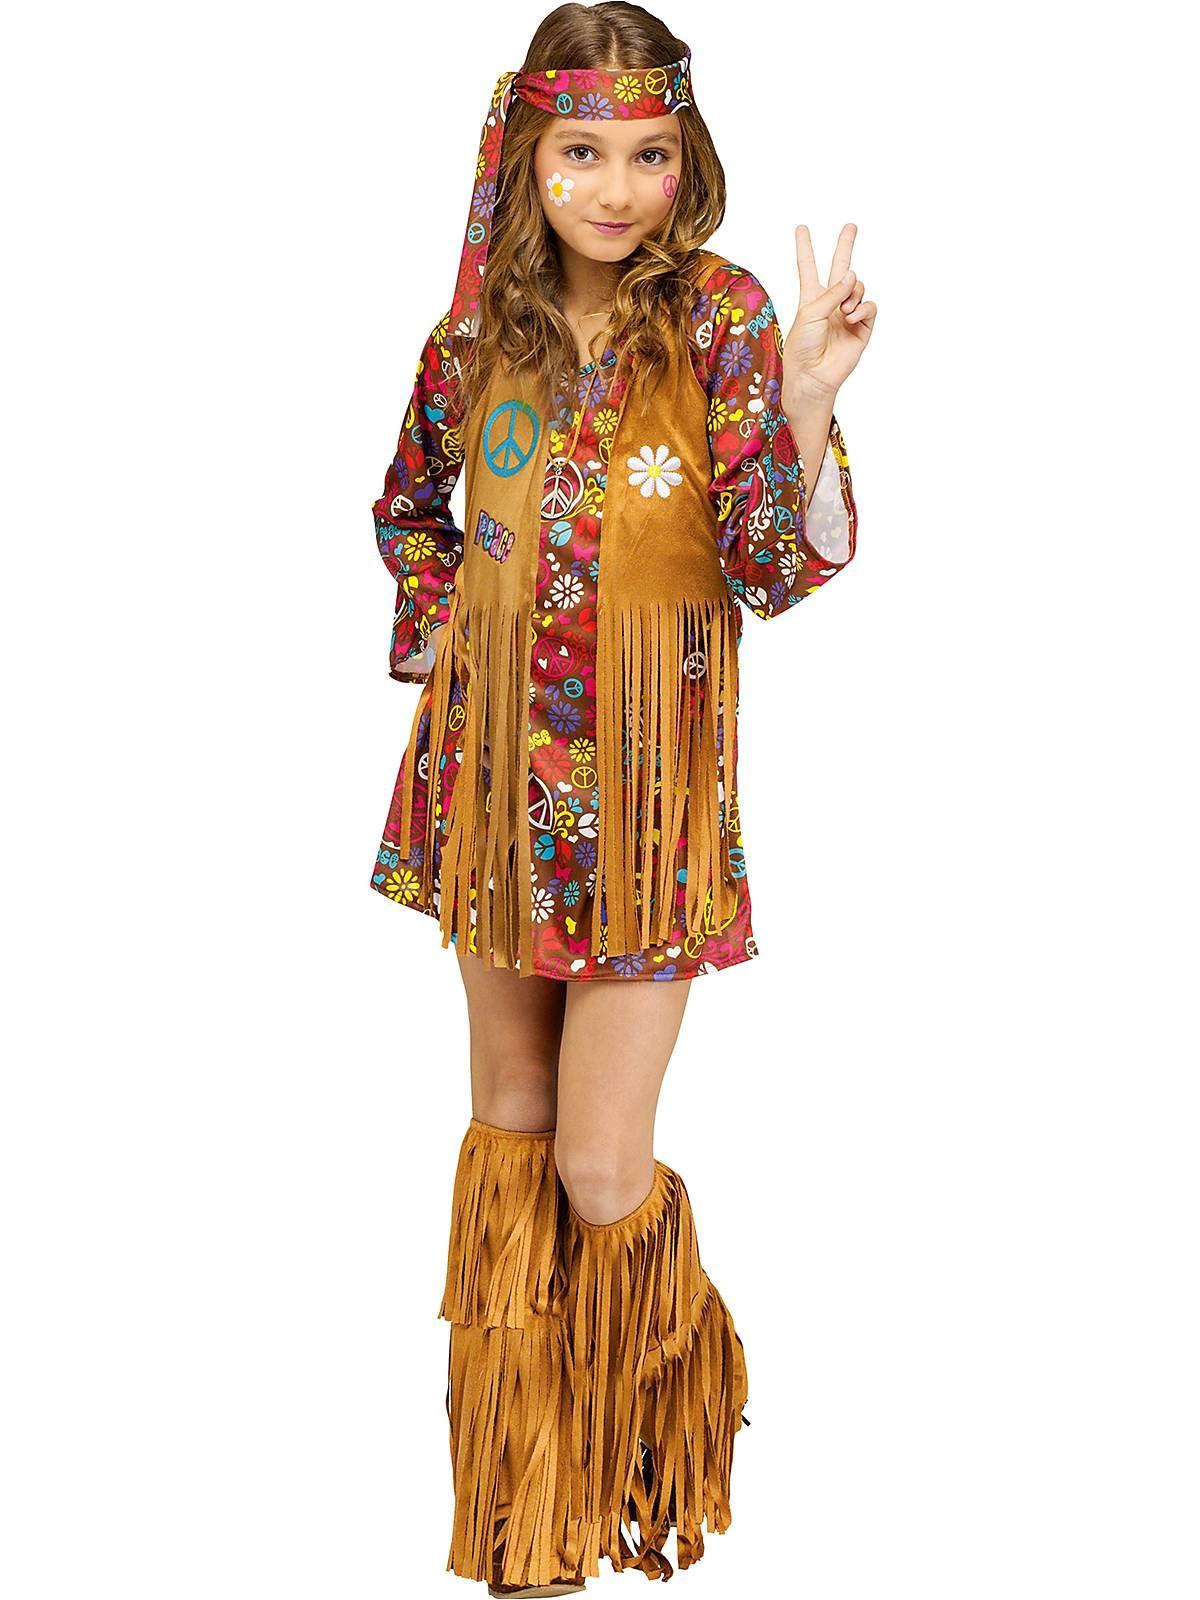 Halloween Costume Ideas For Teenage Girl 2019.Good Ideas For Teenage Girl Halloween Costumes Adinaporter